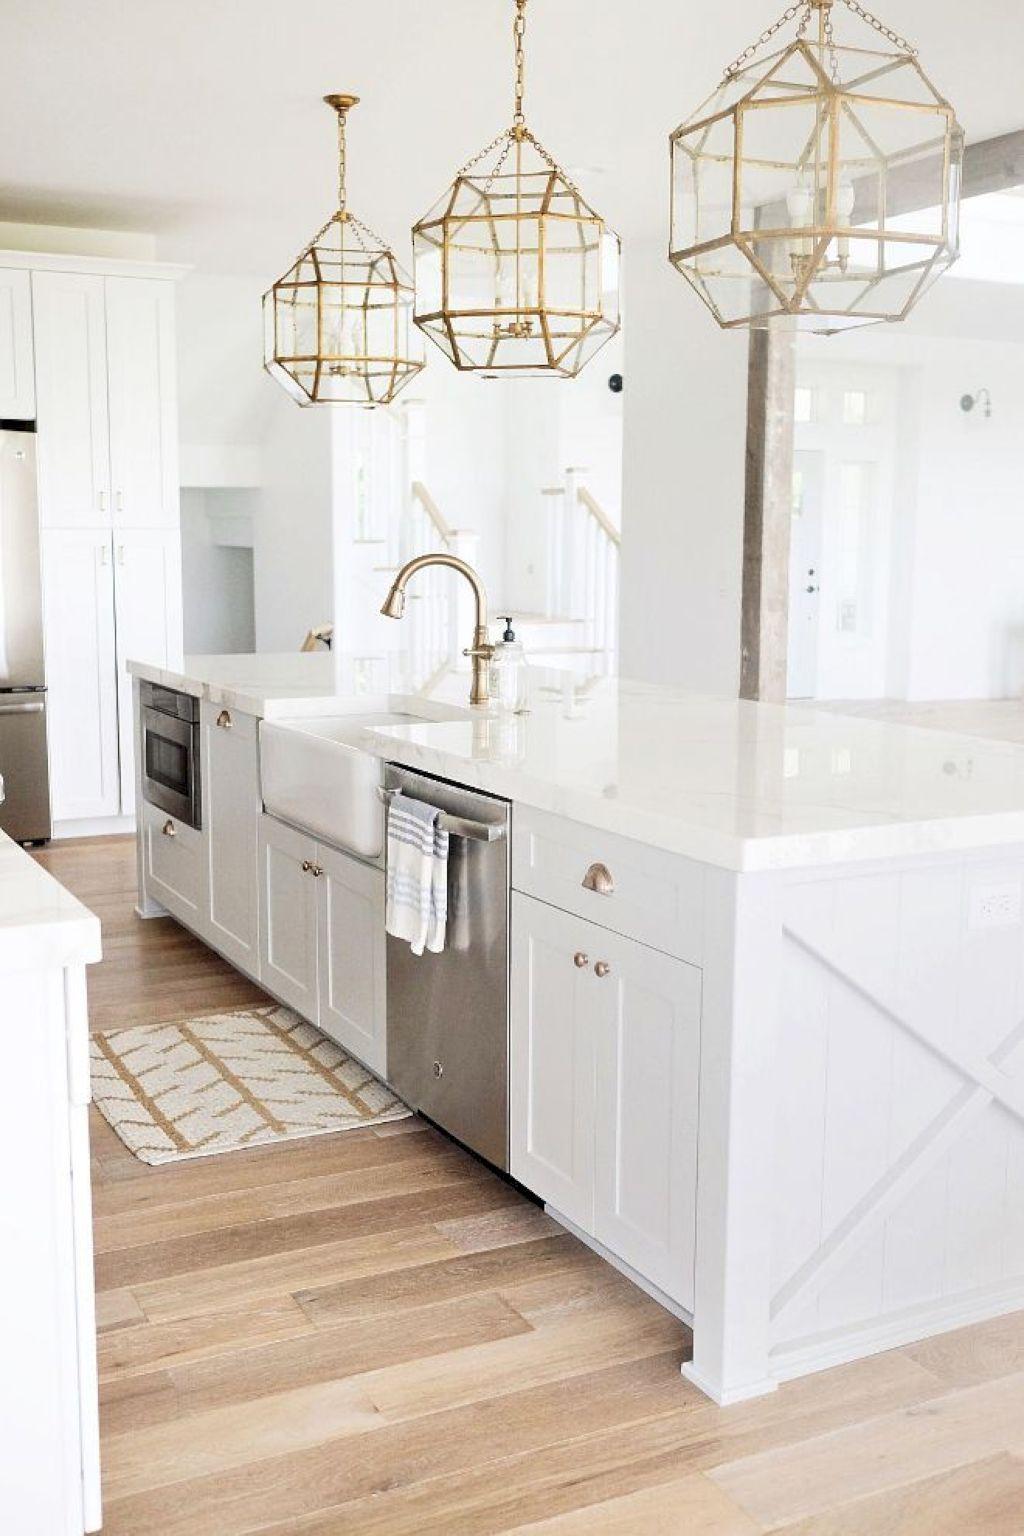 30 Elegant White Kitchen Design and Decor Ideas images